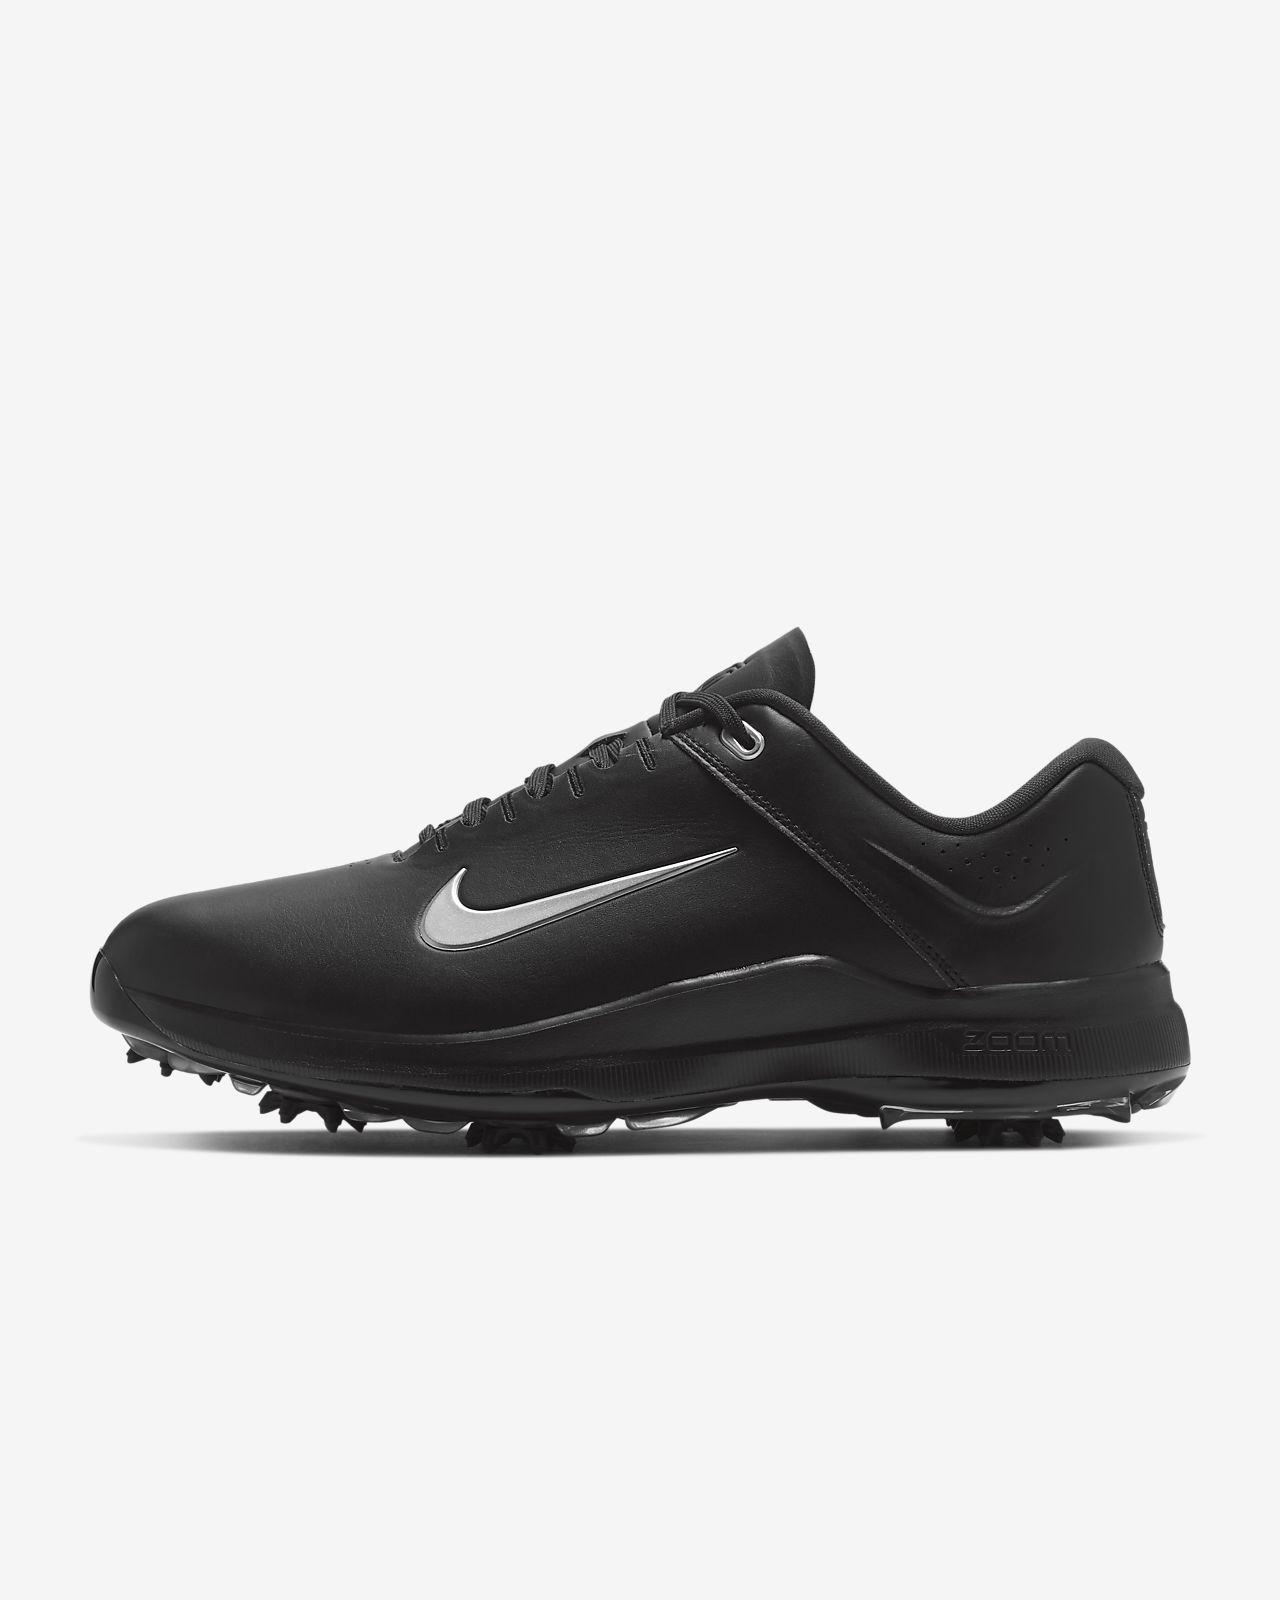 Tiger Woods '20 Men's Golf Shoe (Wide)